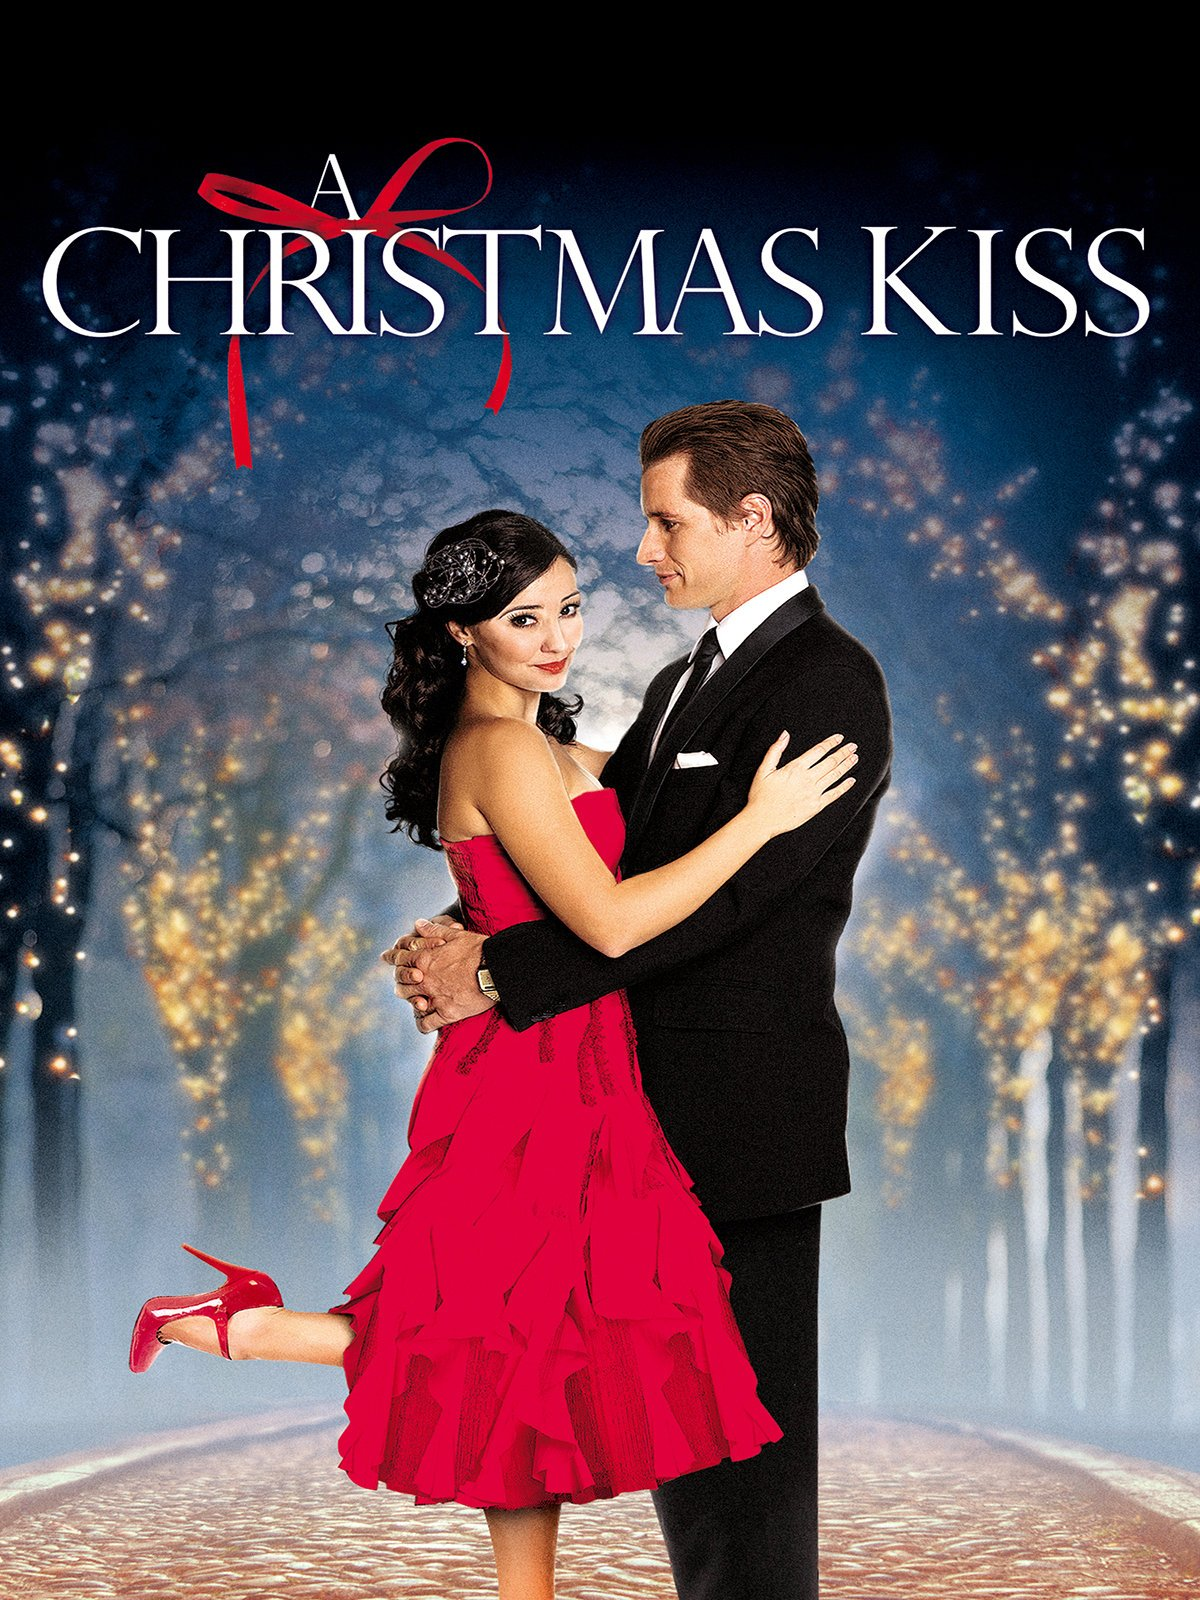 Amazon.com: A Christmas Kiss: Elisabeth Rohm, Laura Breckenridge ...